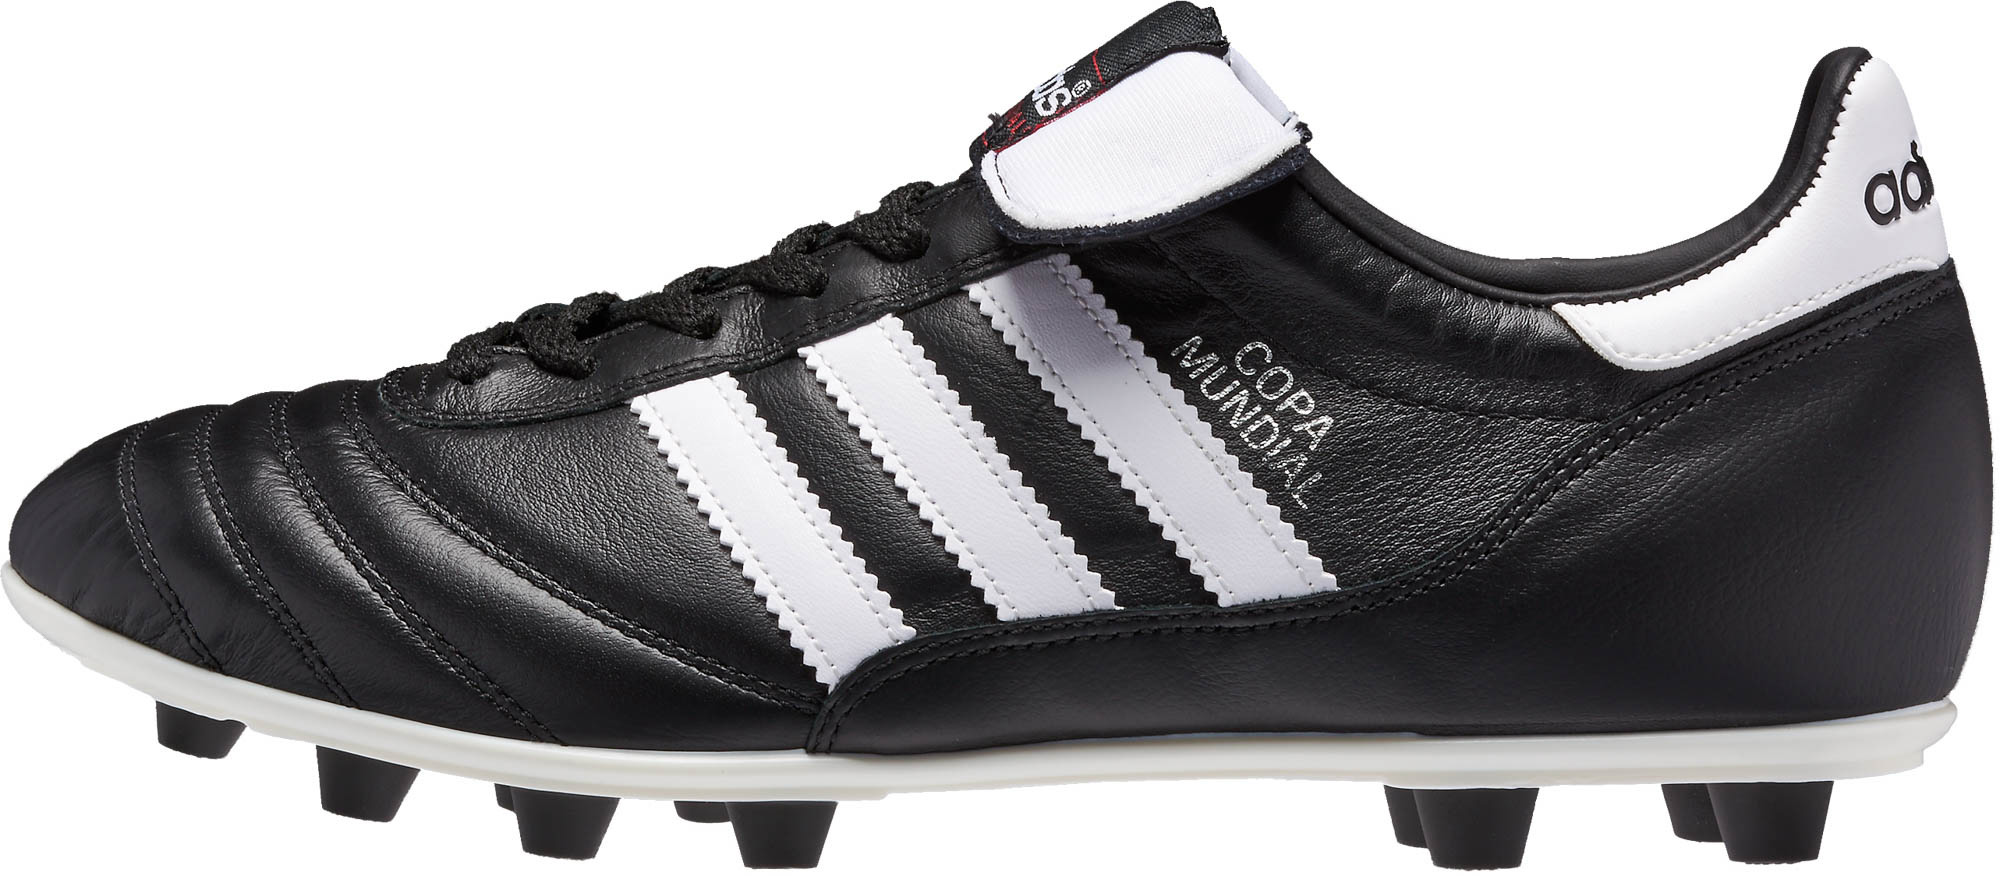 adidas Copa Mundial FG - Black with